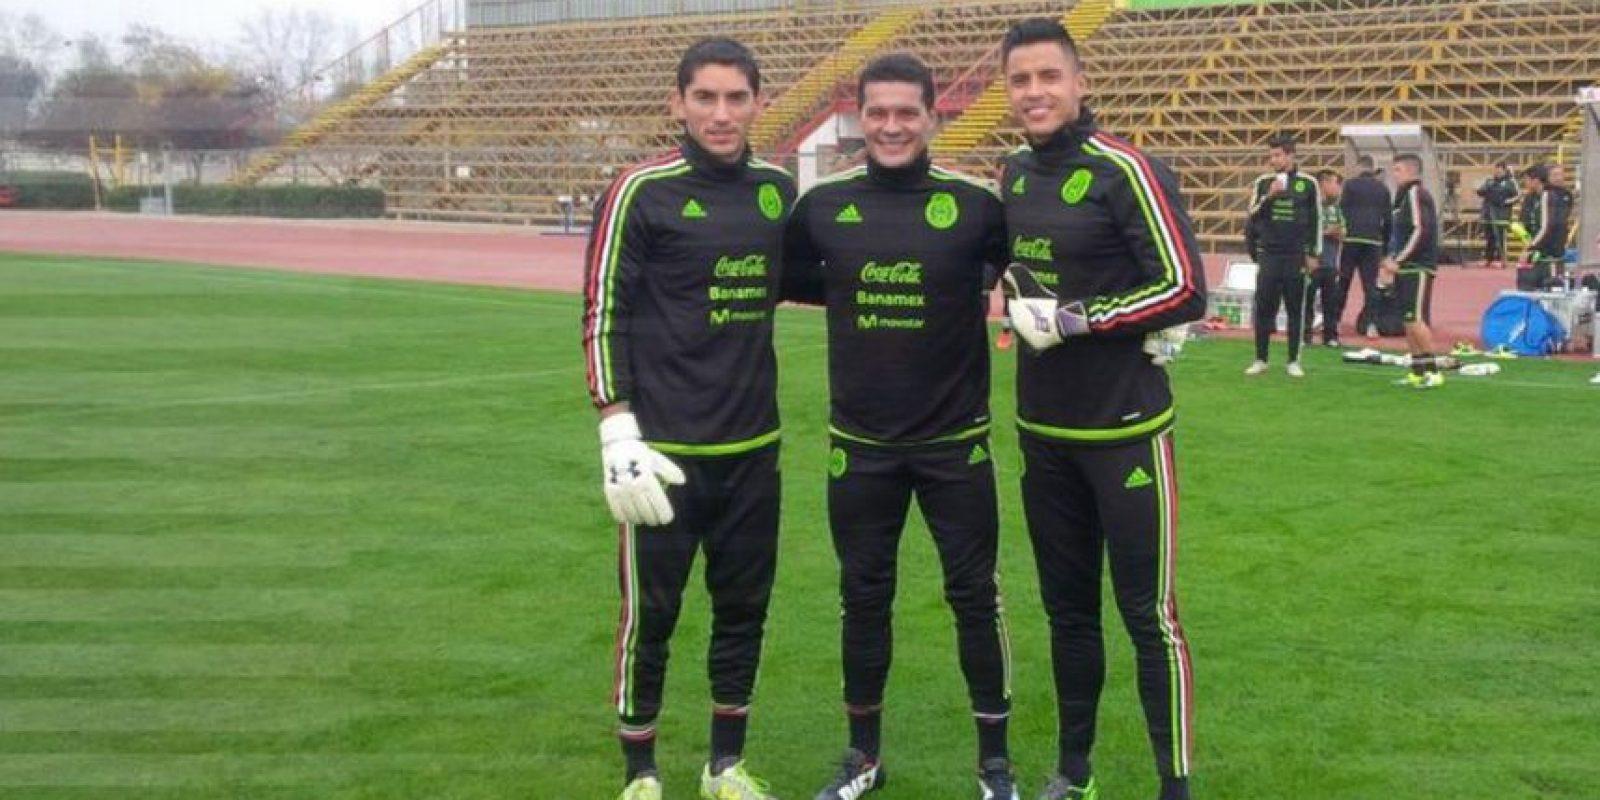 Jose Corona será el portero titular de México Foto:Via twitter.com/miseleccionmx